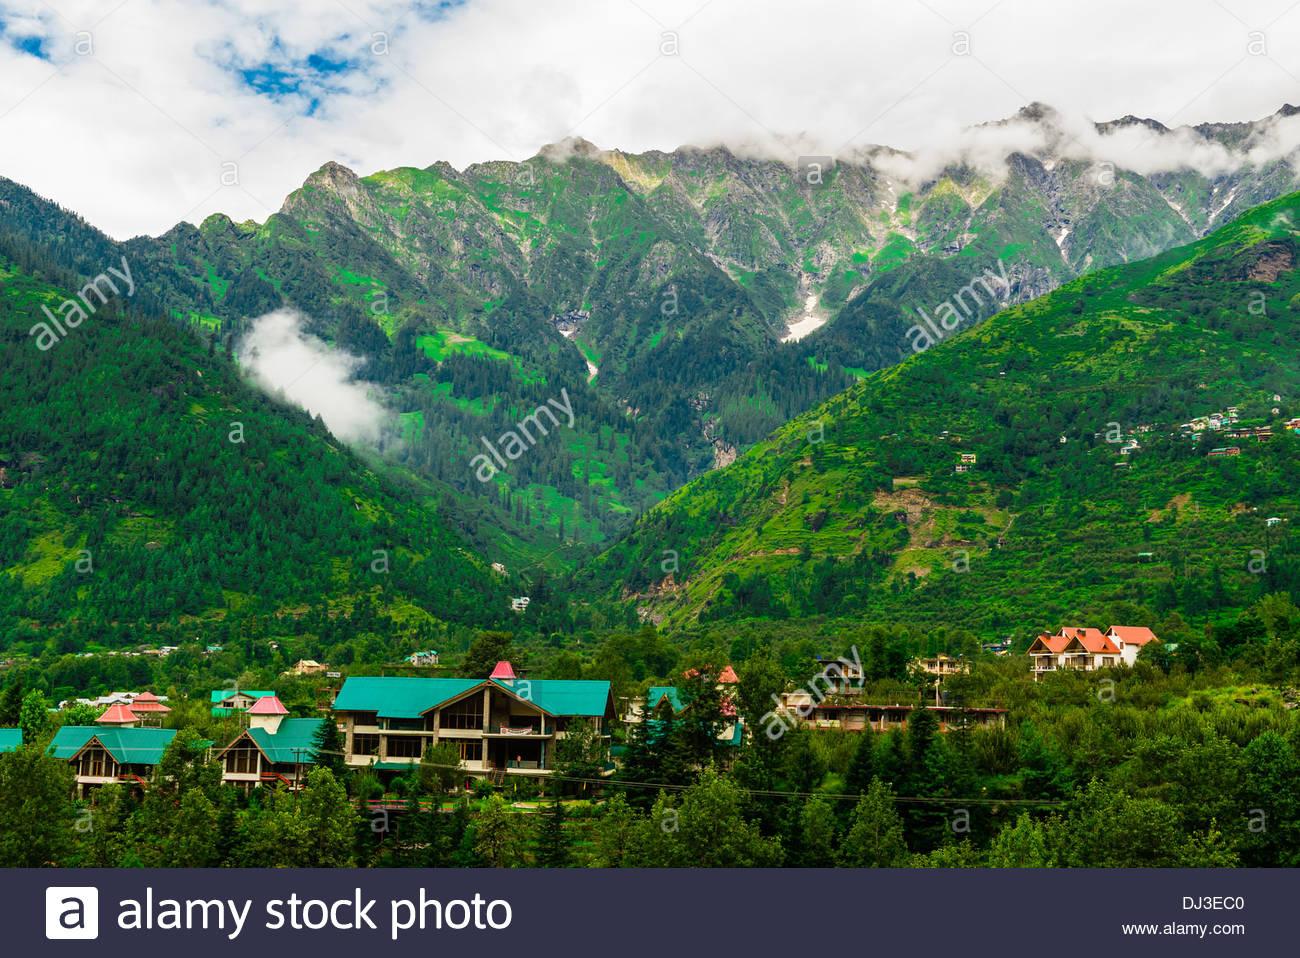 Bashisht, near Manali, Himachal Pradesh, India. - Stock Image